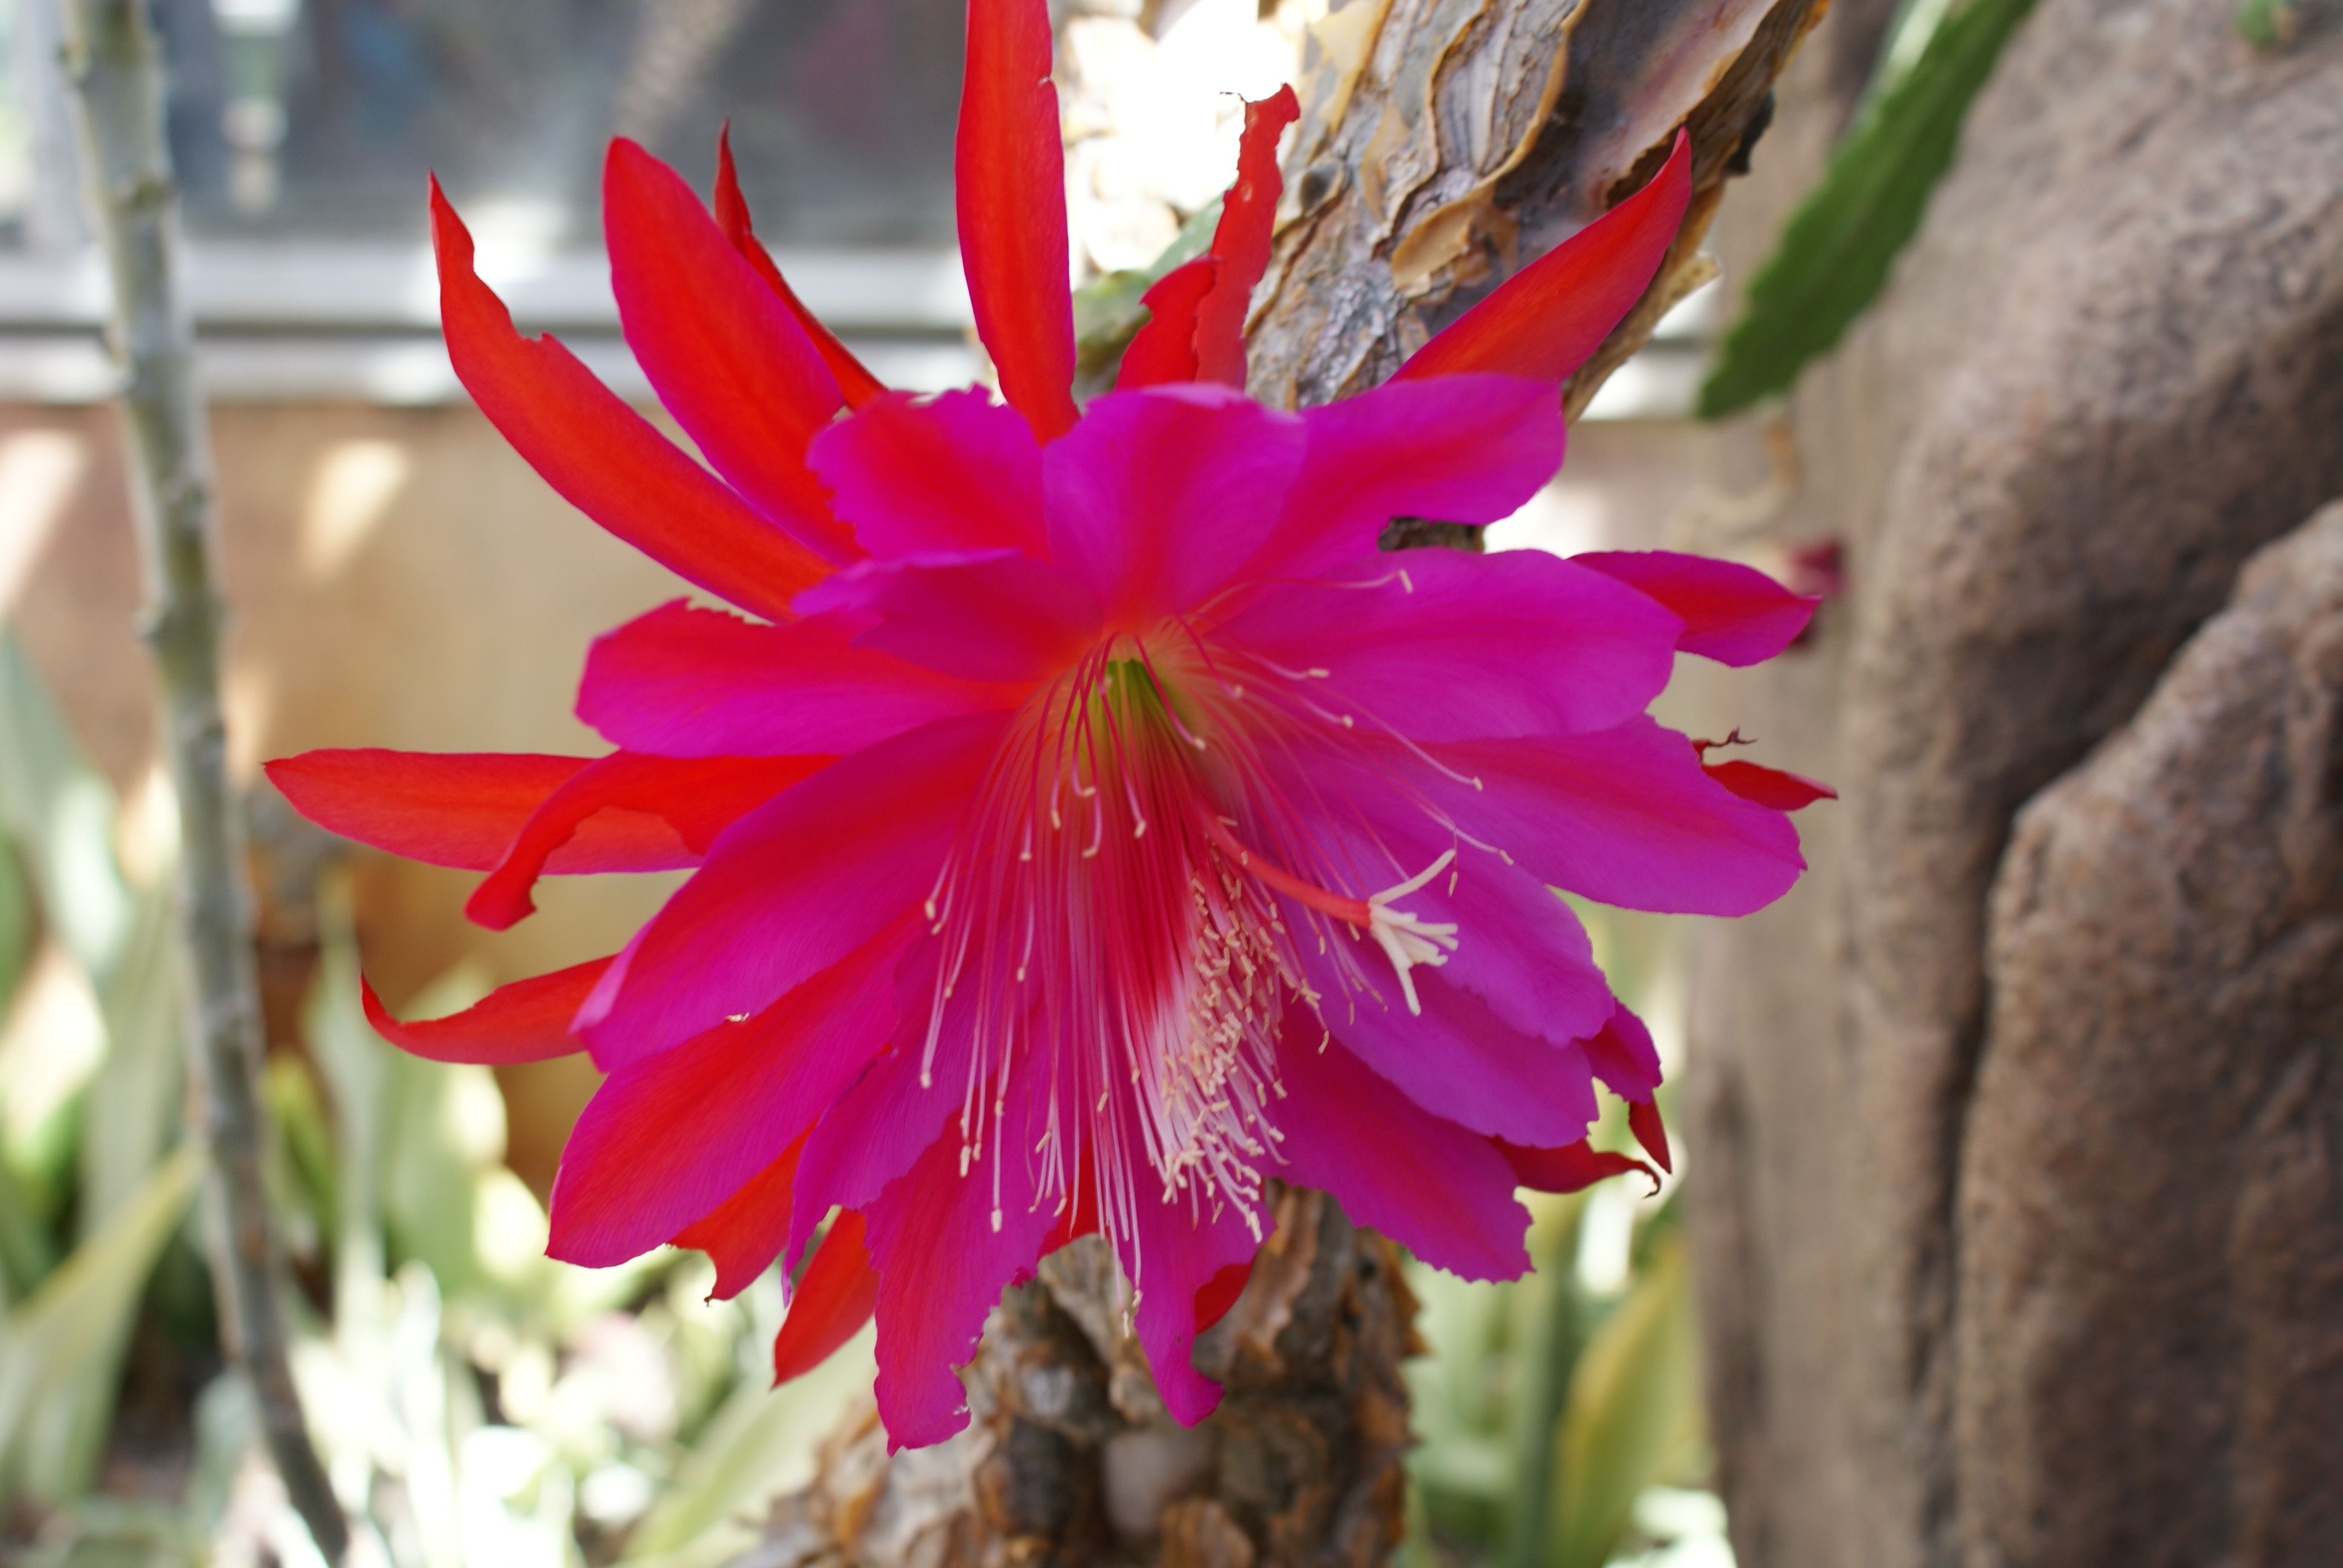 Amazing flower photo | Flower Power | Pinterest